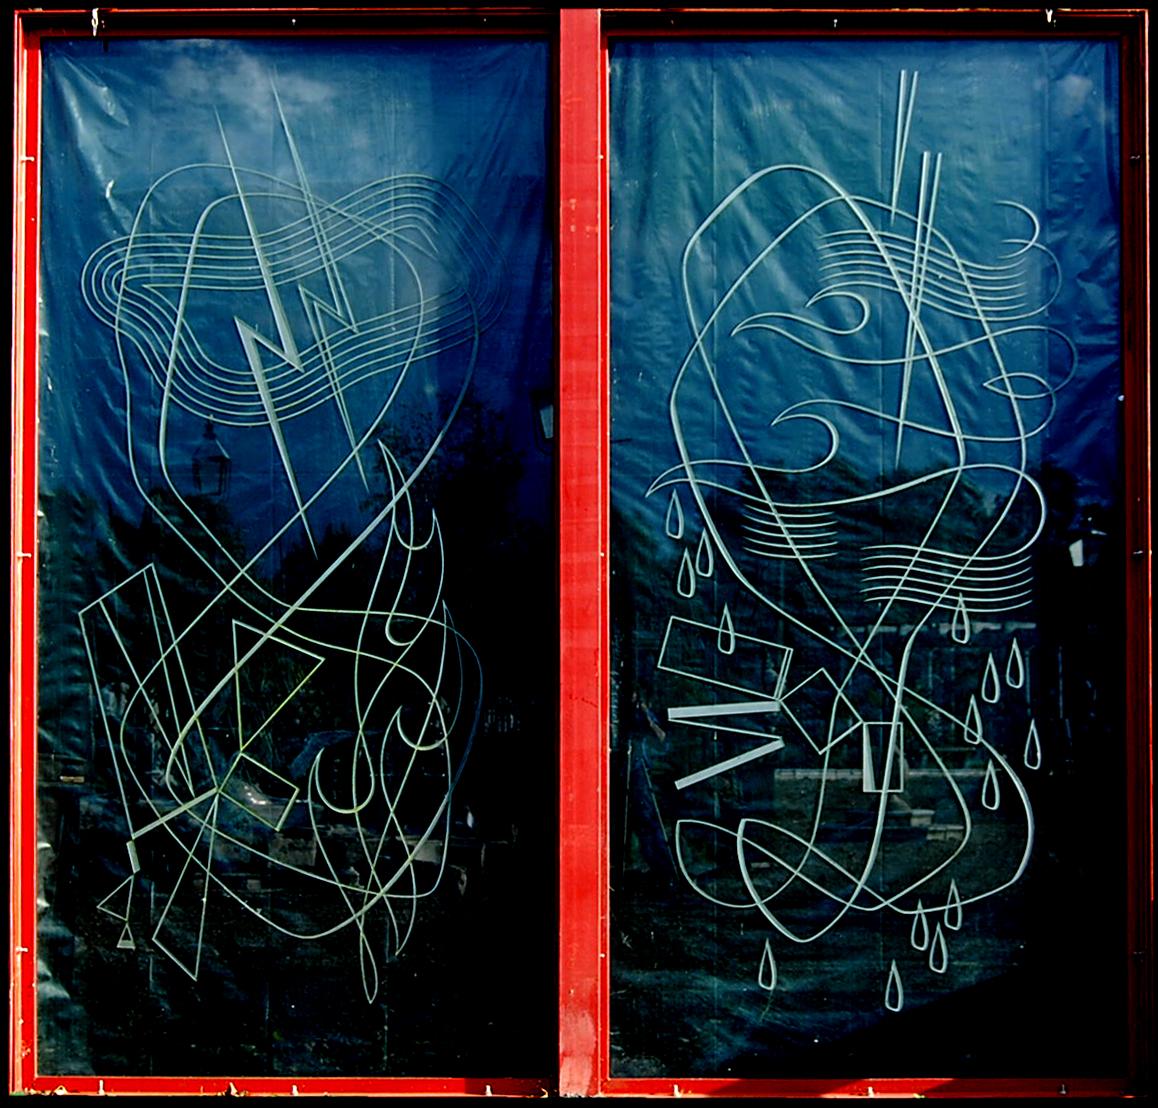 Helen Monro glass panes 3.66m high